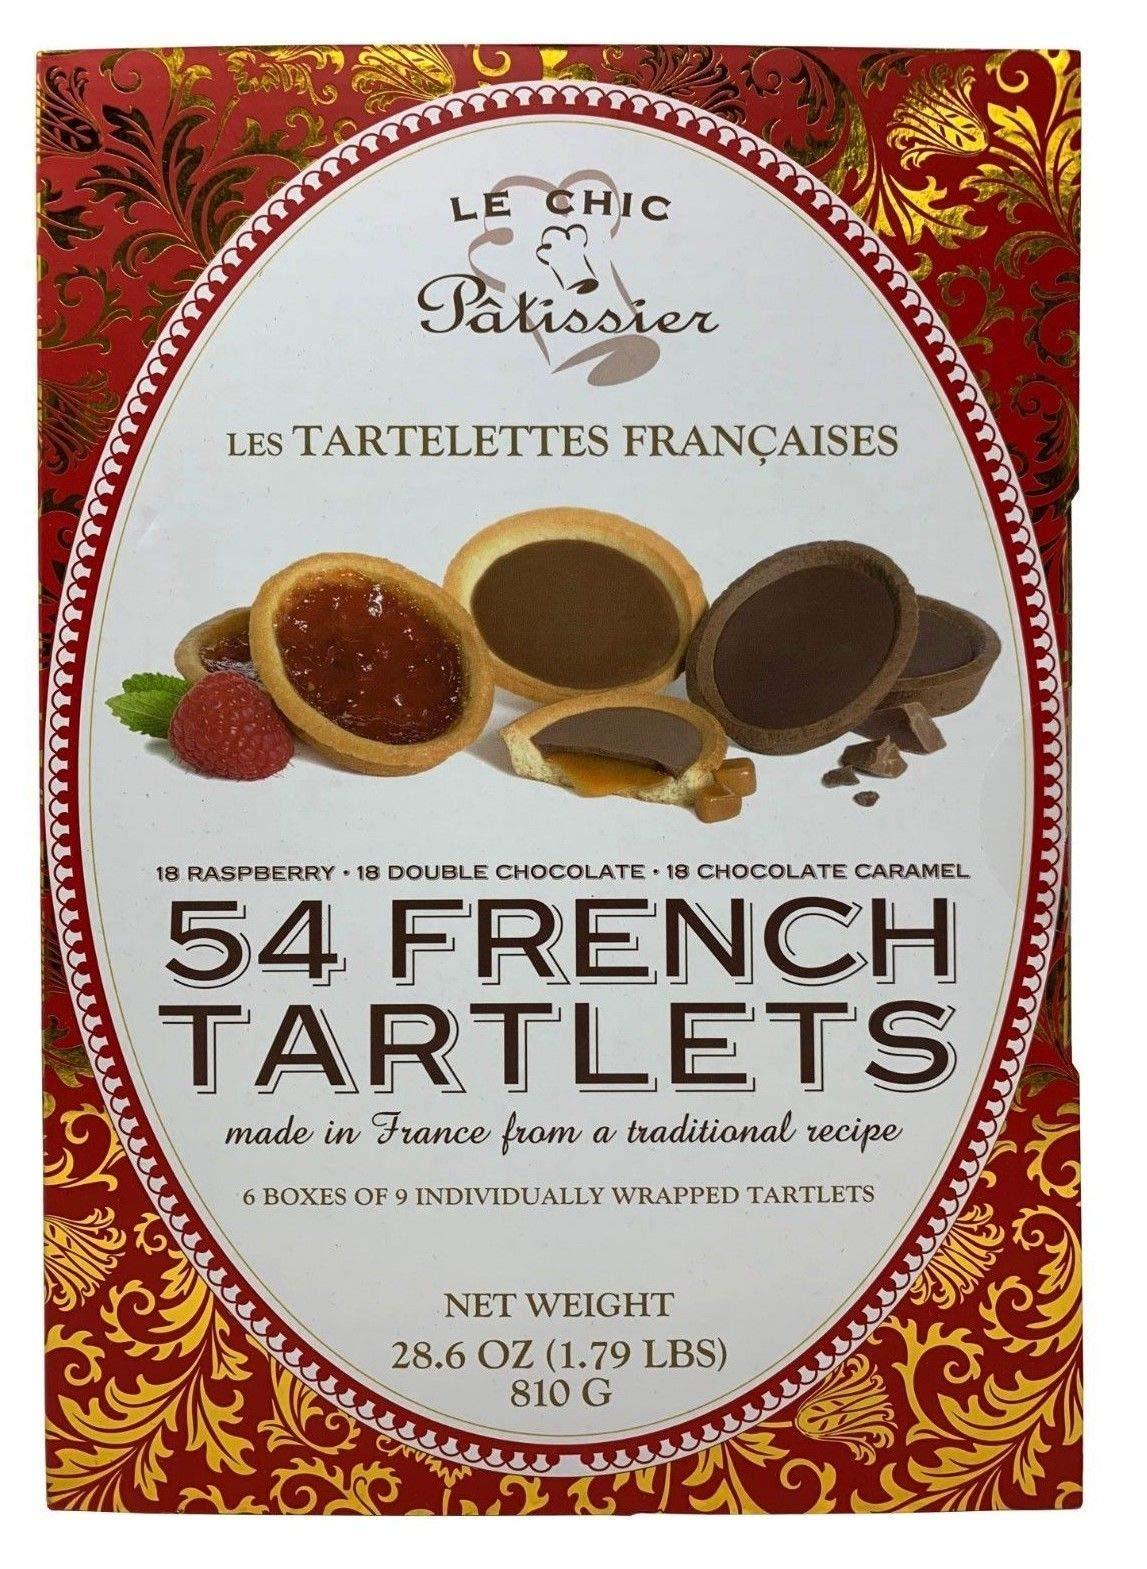 Le Chic Patissier Les Tartelettes Francaises 54 French Tartlets (1)